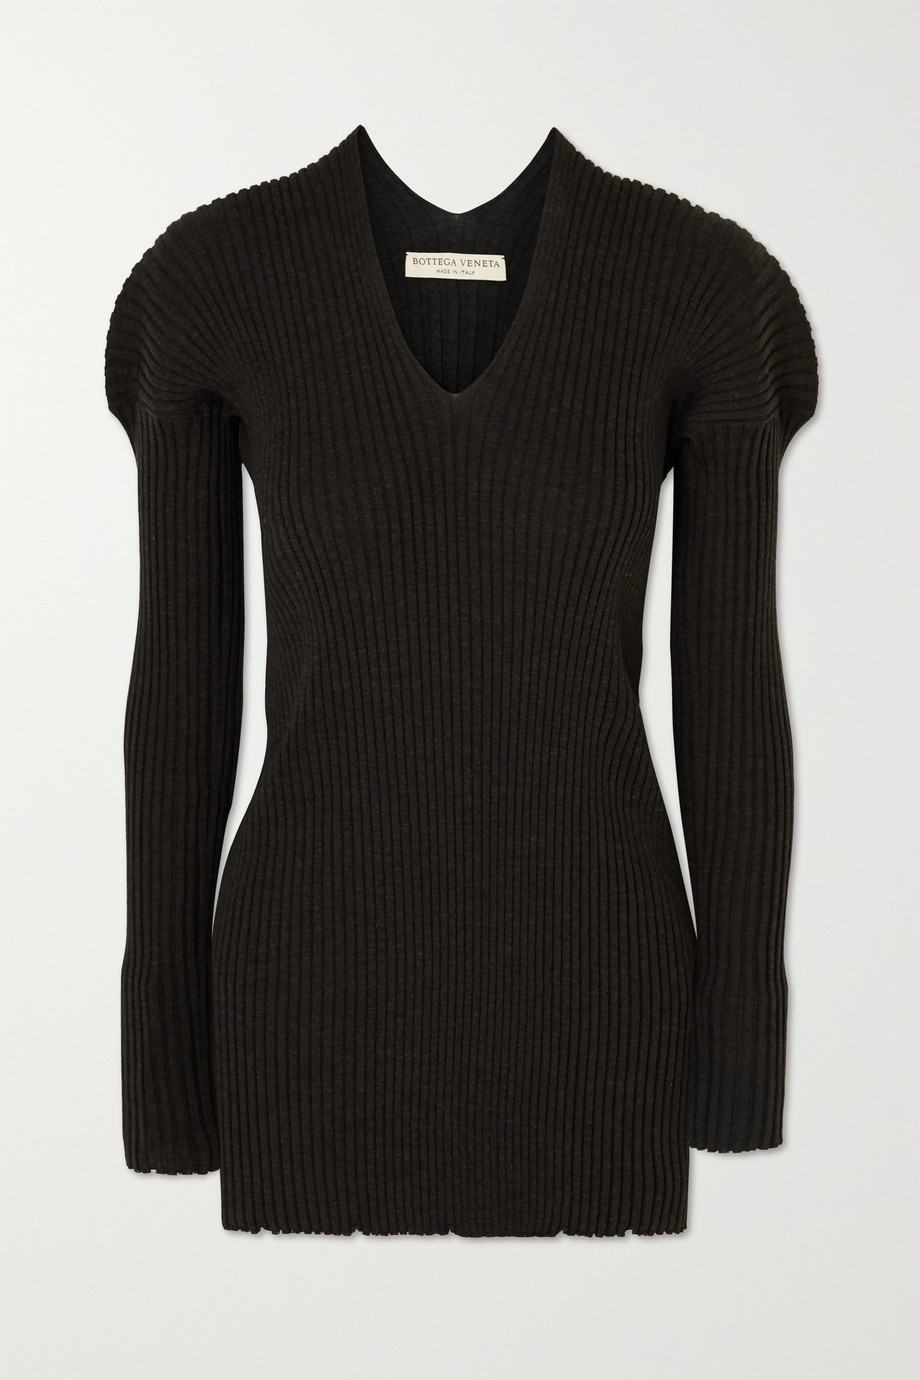 Bottega Veneta Ribbed wool sweater